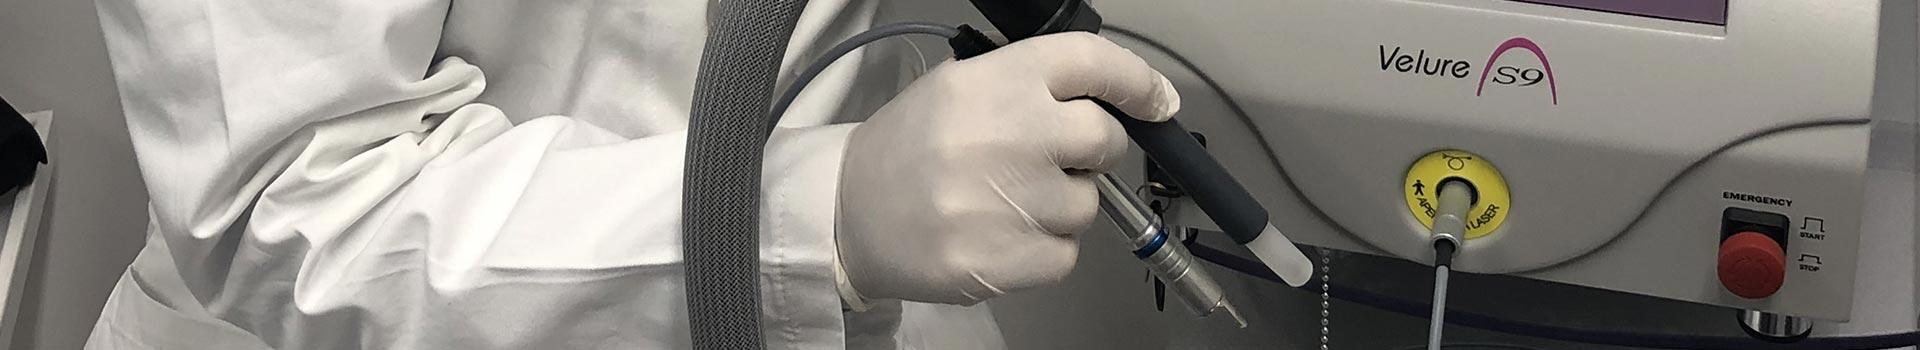 stefanocatrani it dermatologia-pediatrica 004